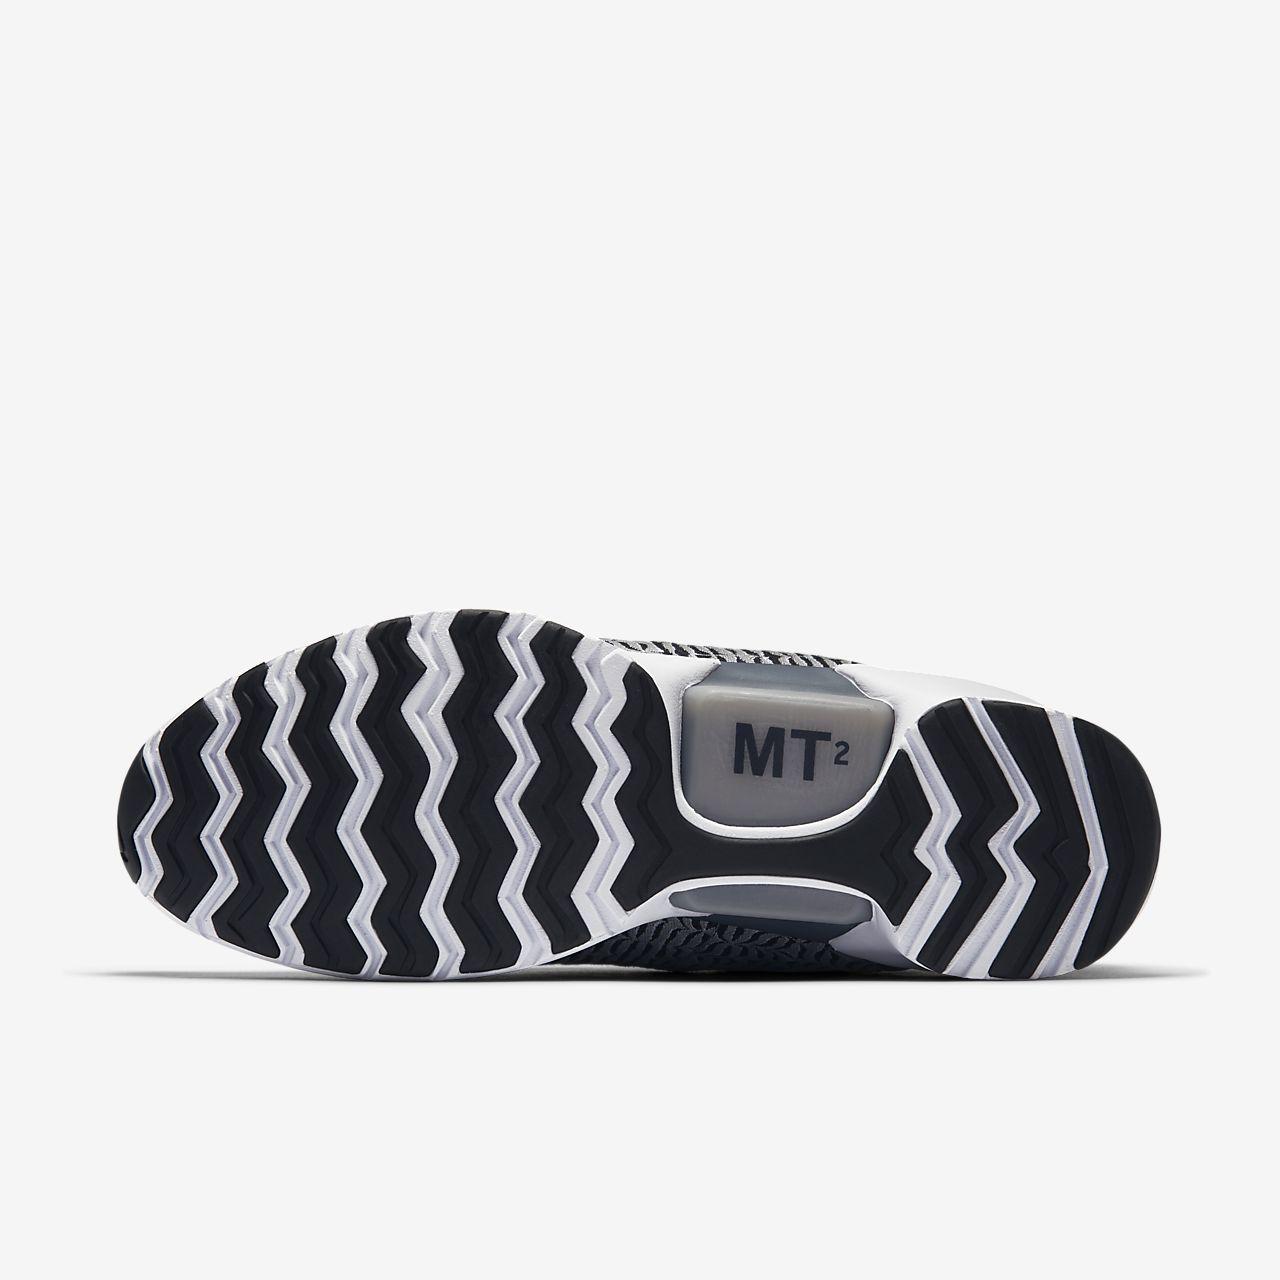 ... Nike HyperAdapt 1.0 Men's Shoe